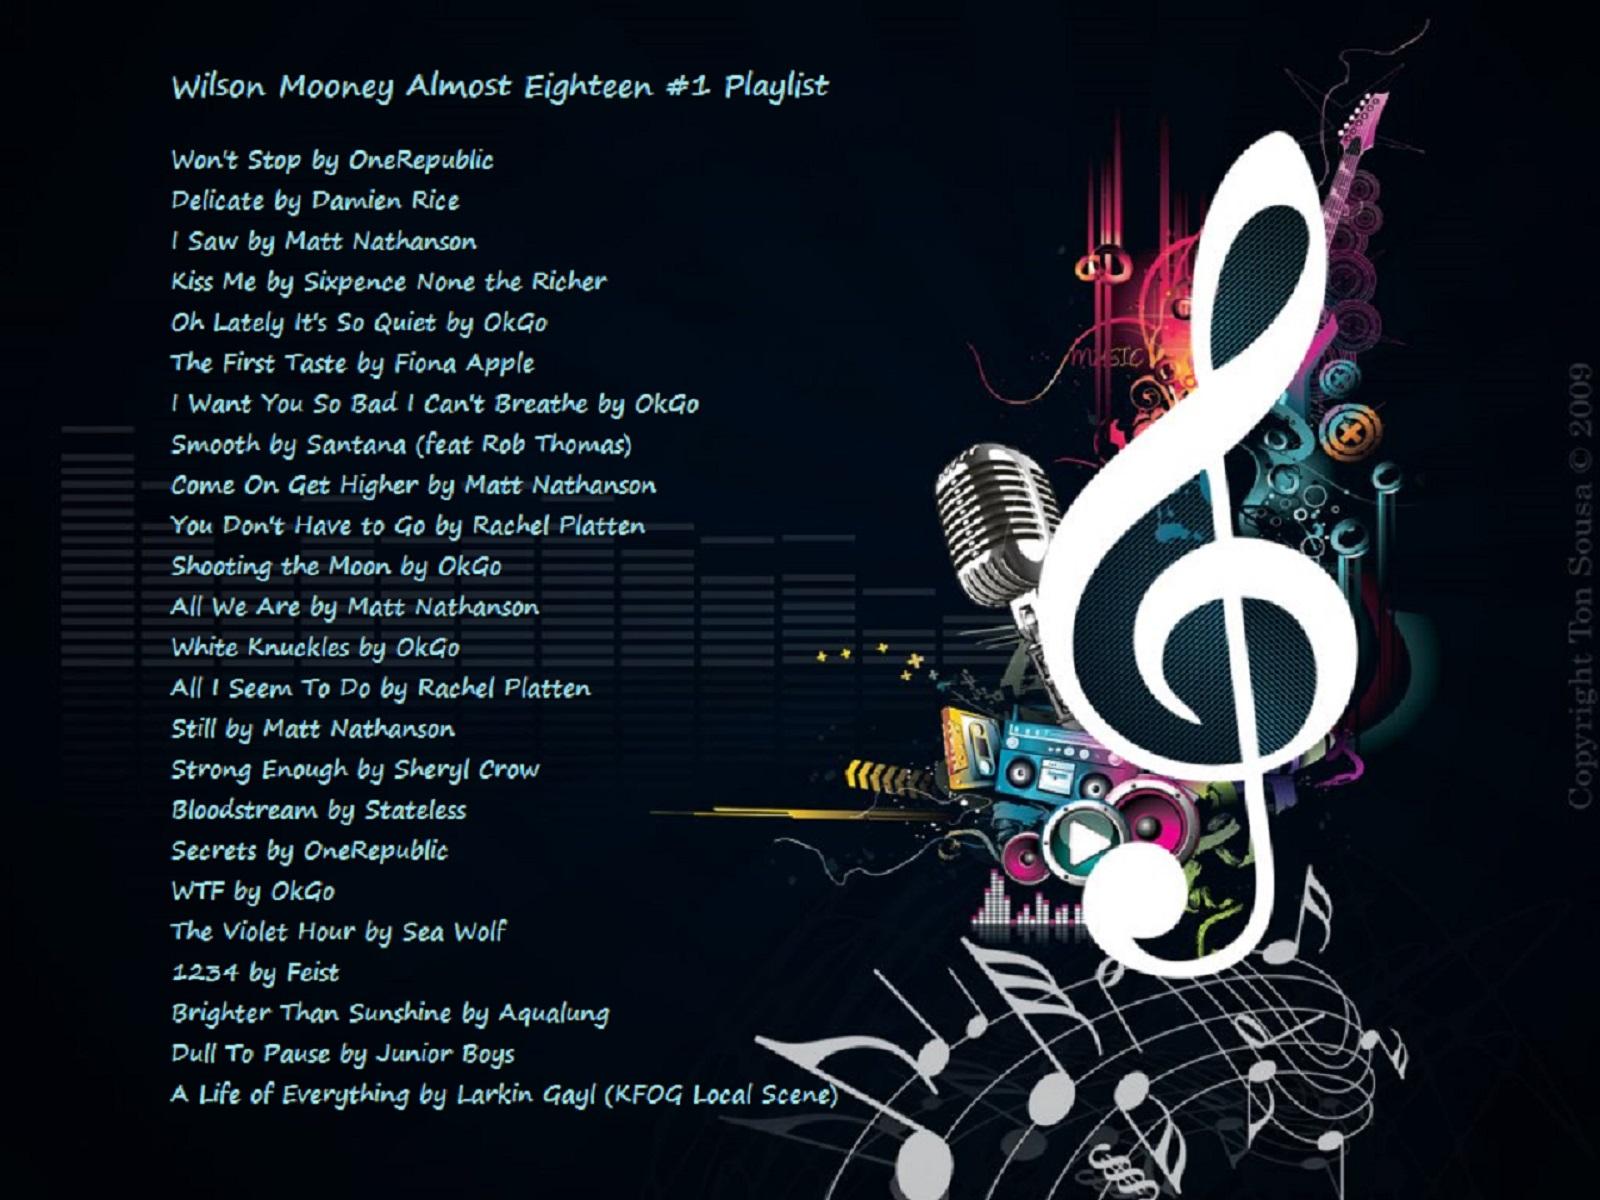 music playlist image